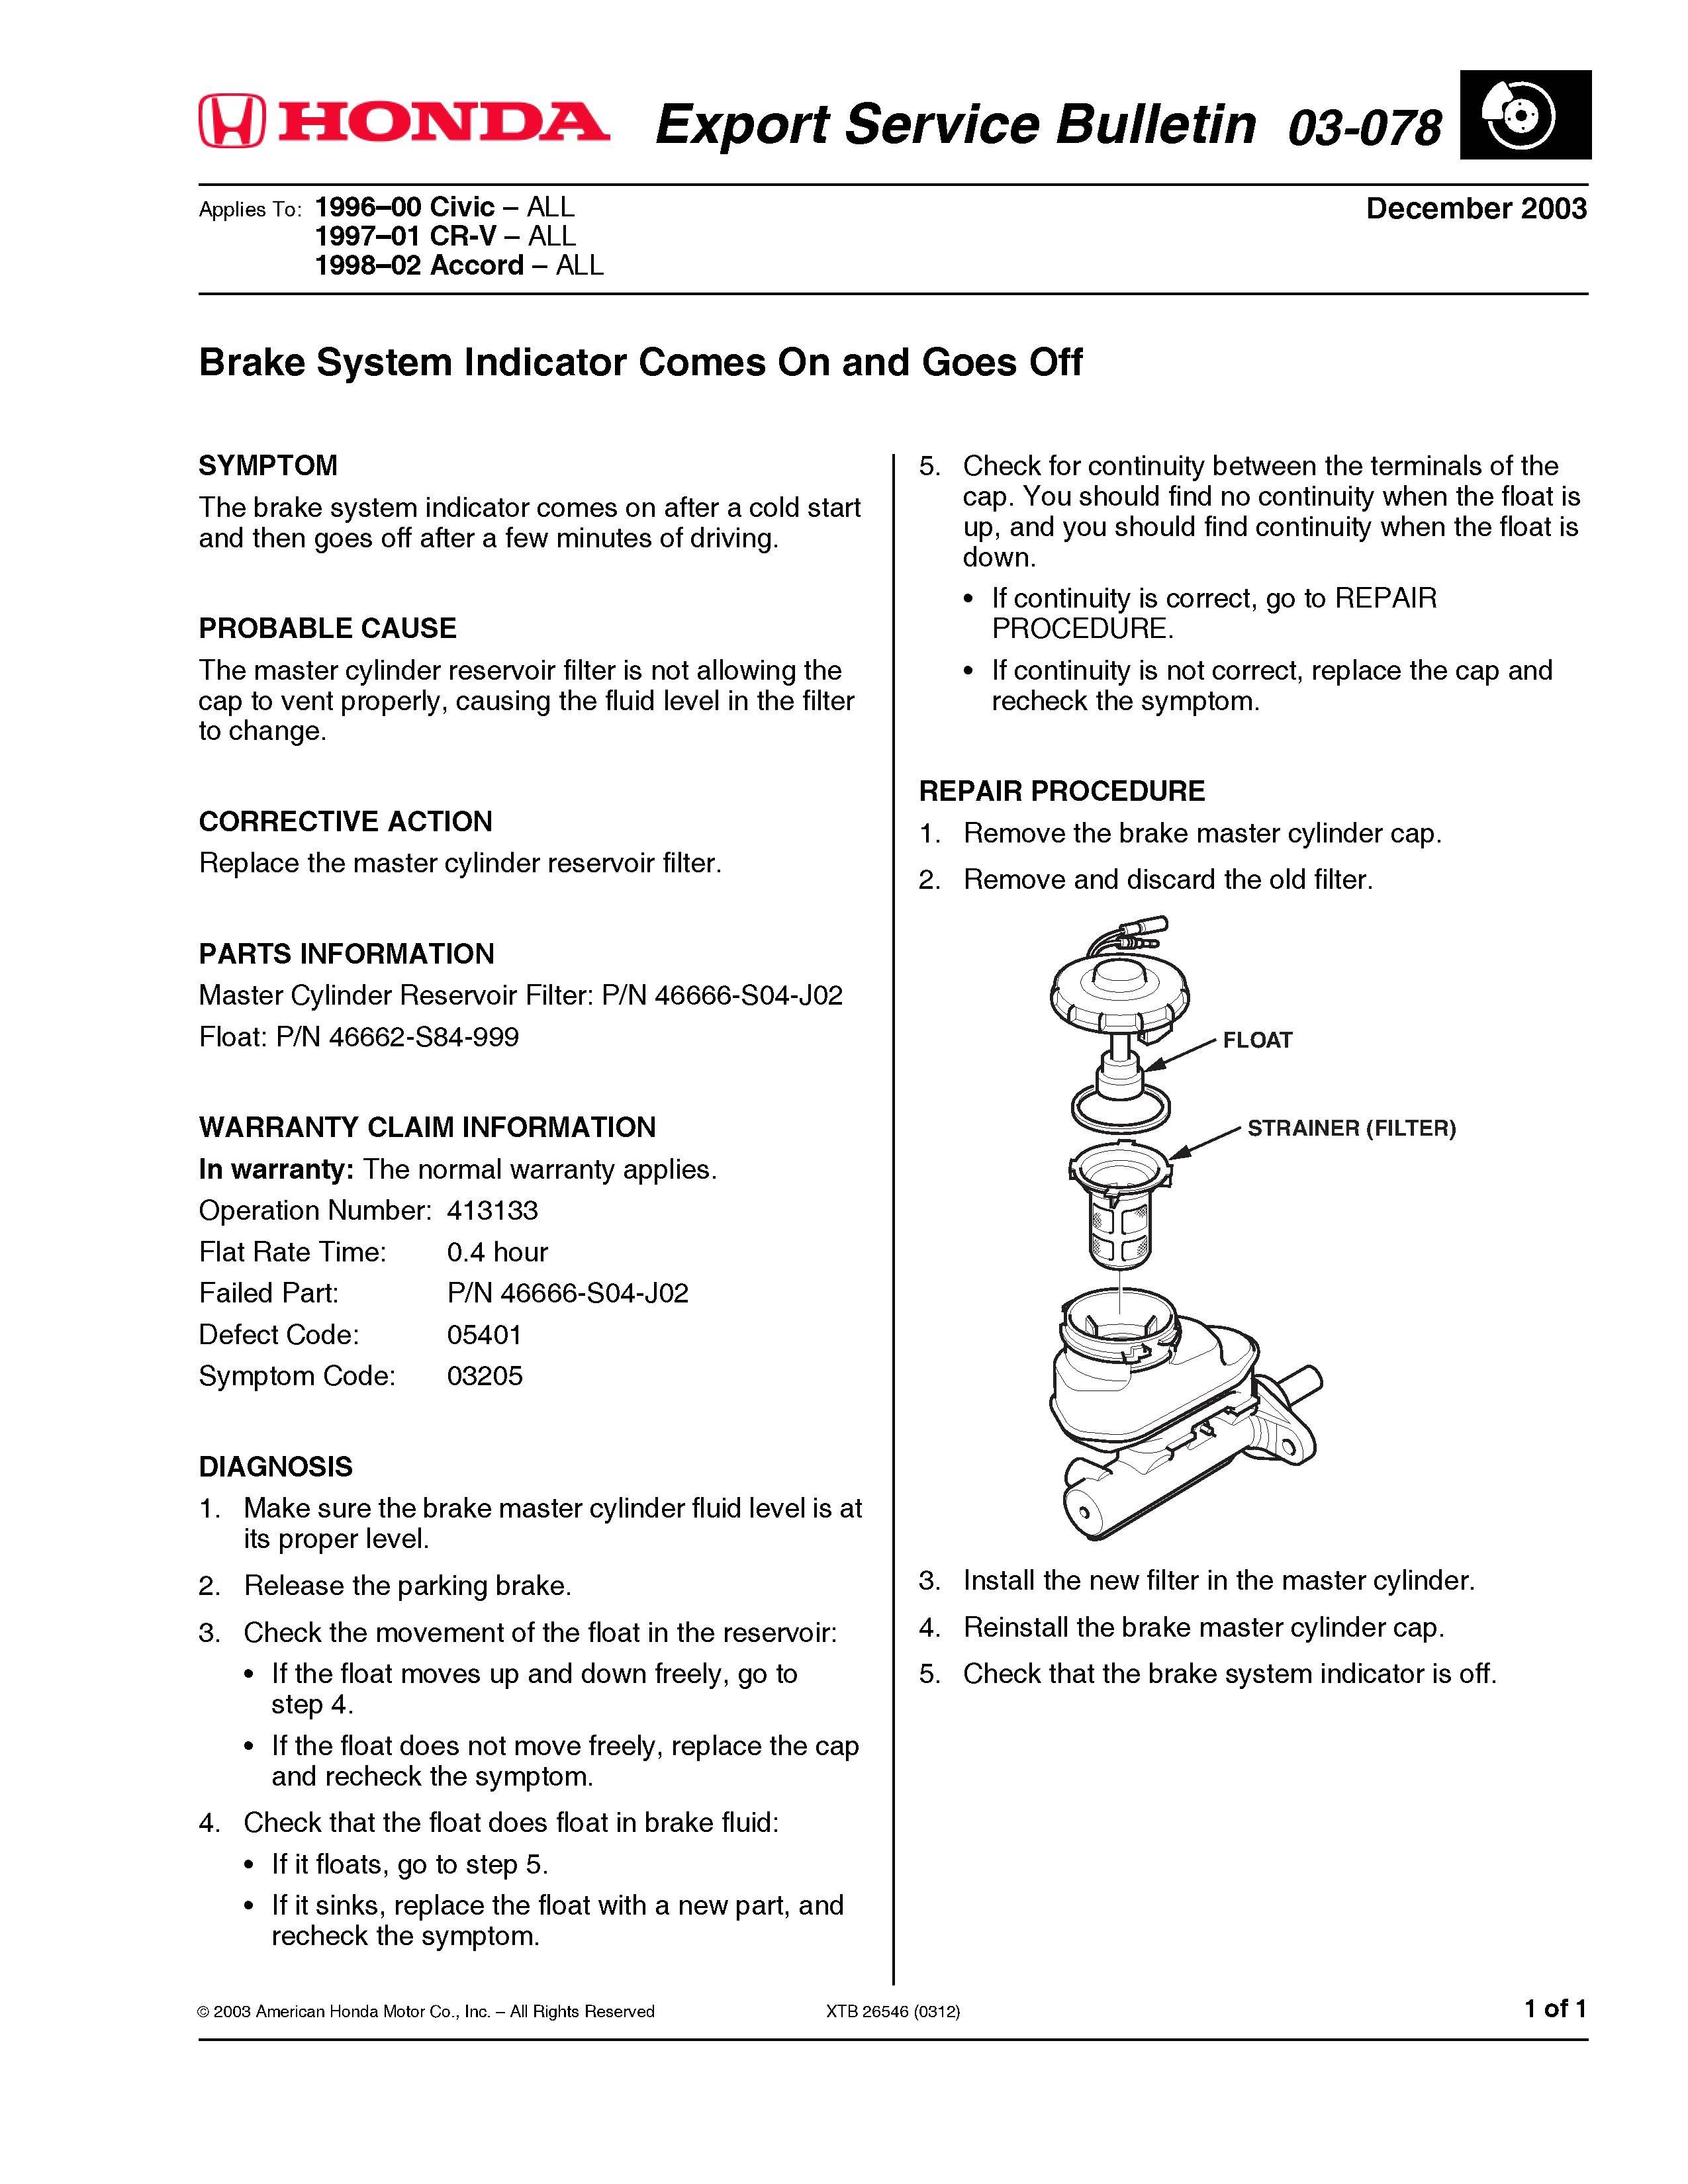 Honda Accord: Brake System Indicator